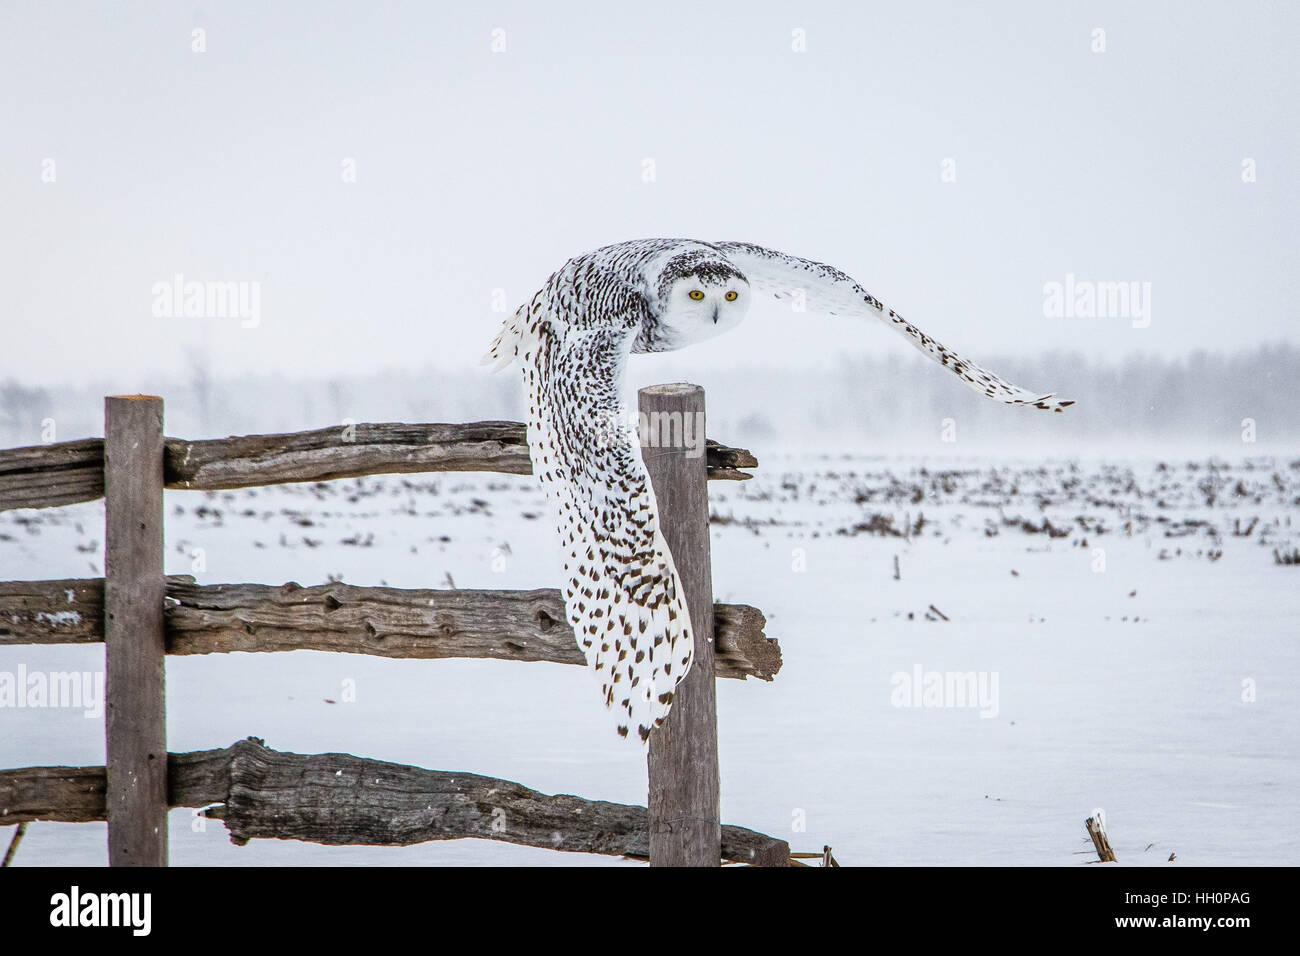 Snowy Owl 2017 - Stock Image